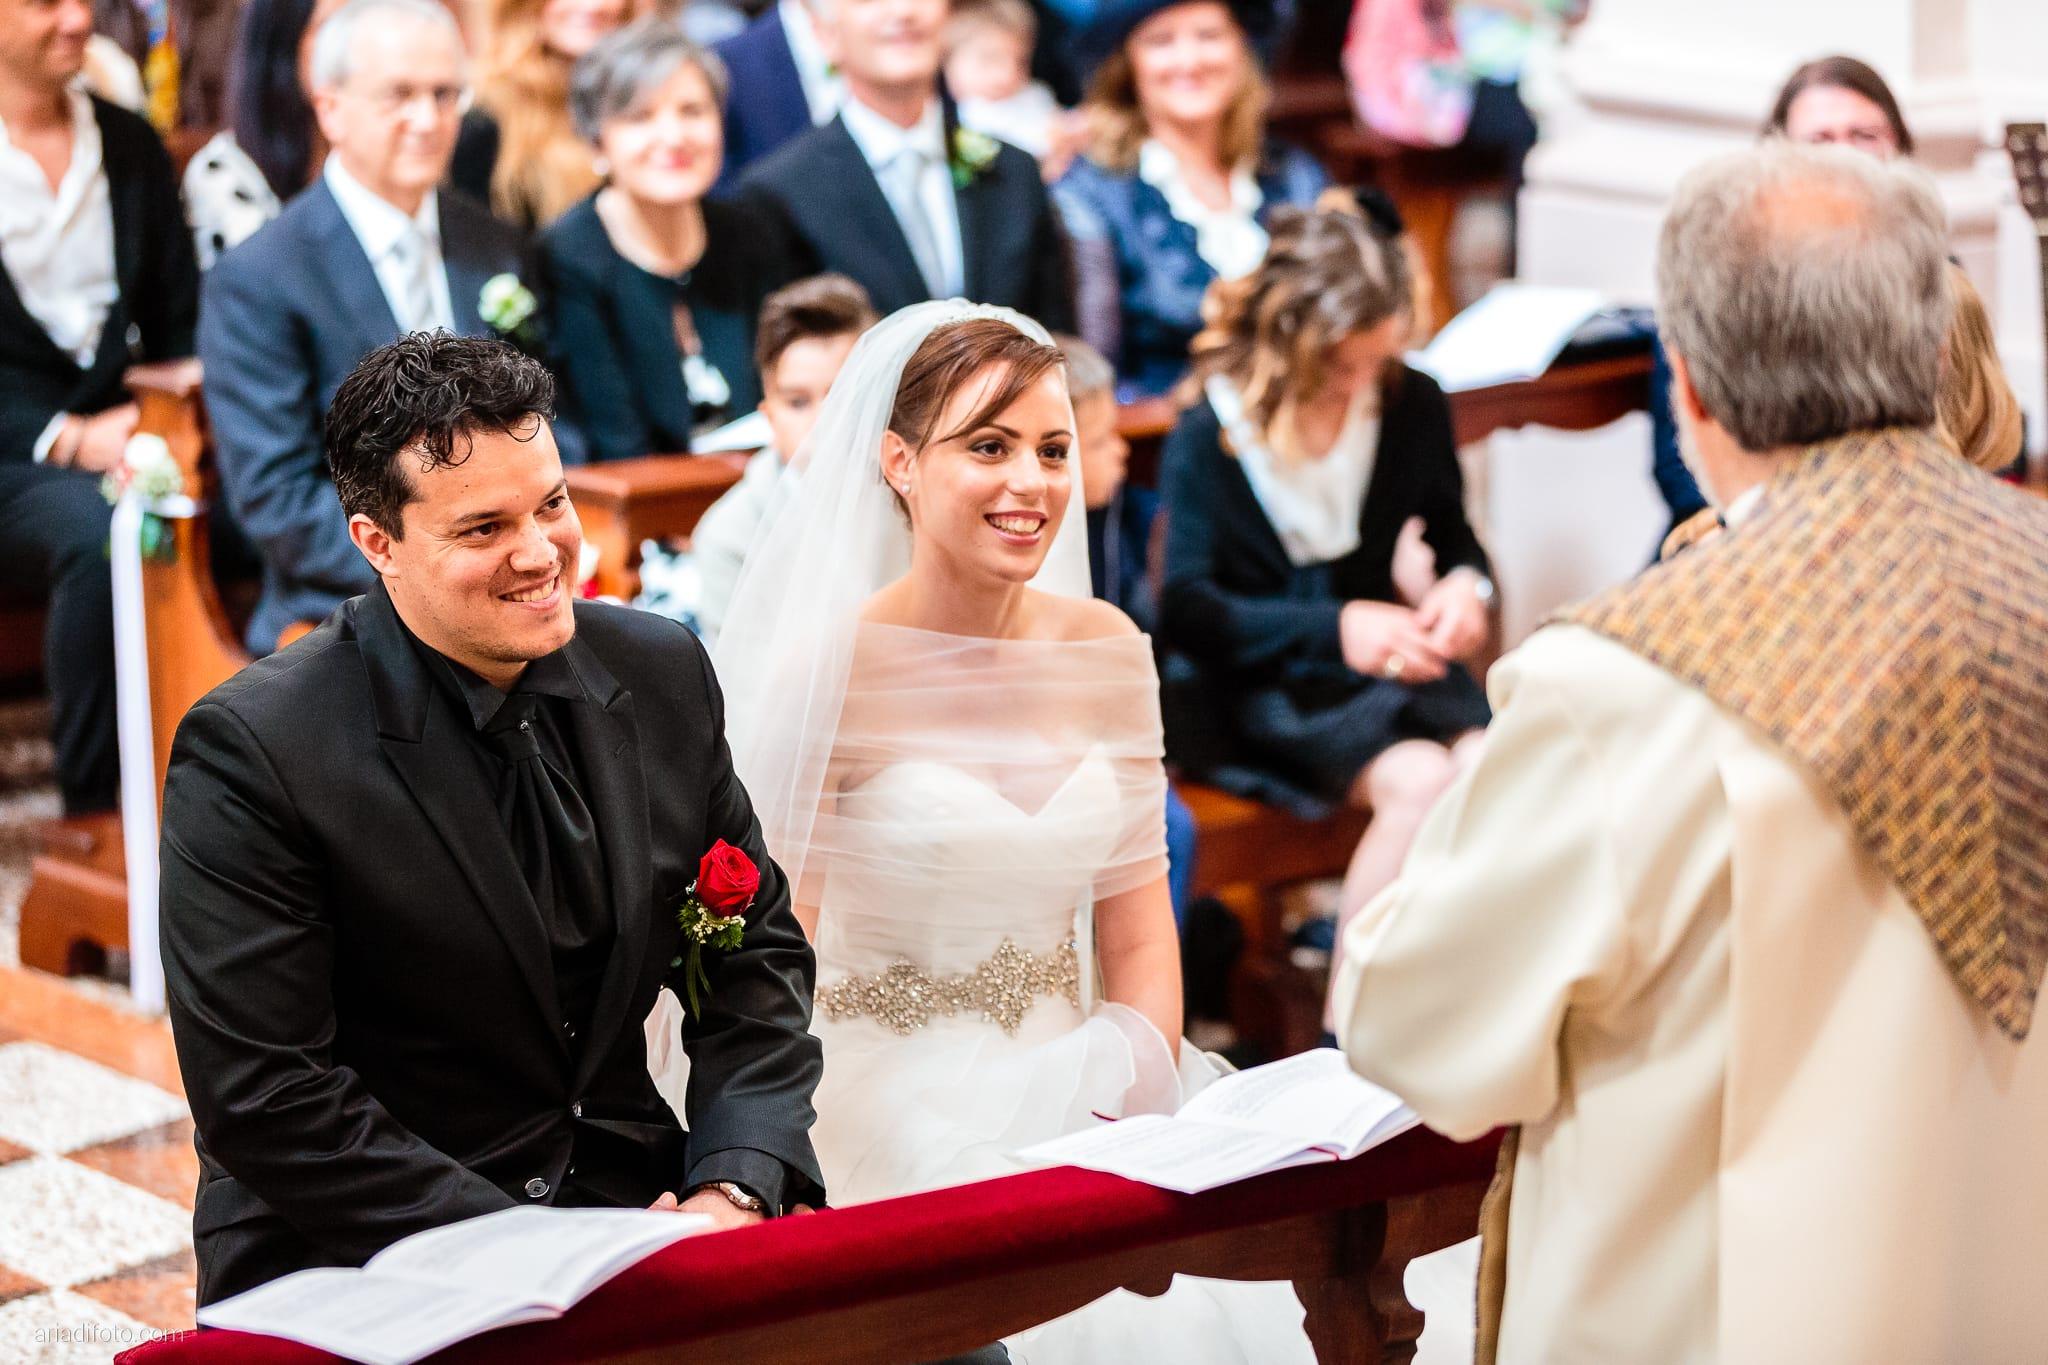 Sarah Matteo Matrimonio Moruzzo Chiesa Santa Maria Gruagno Agriturismo Il Vagabondo Buttrio Udine cerimonia